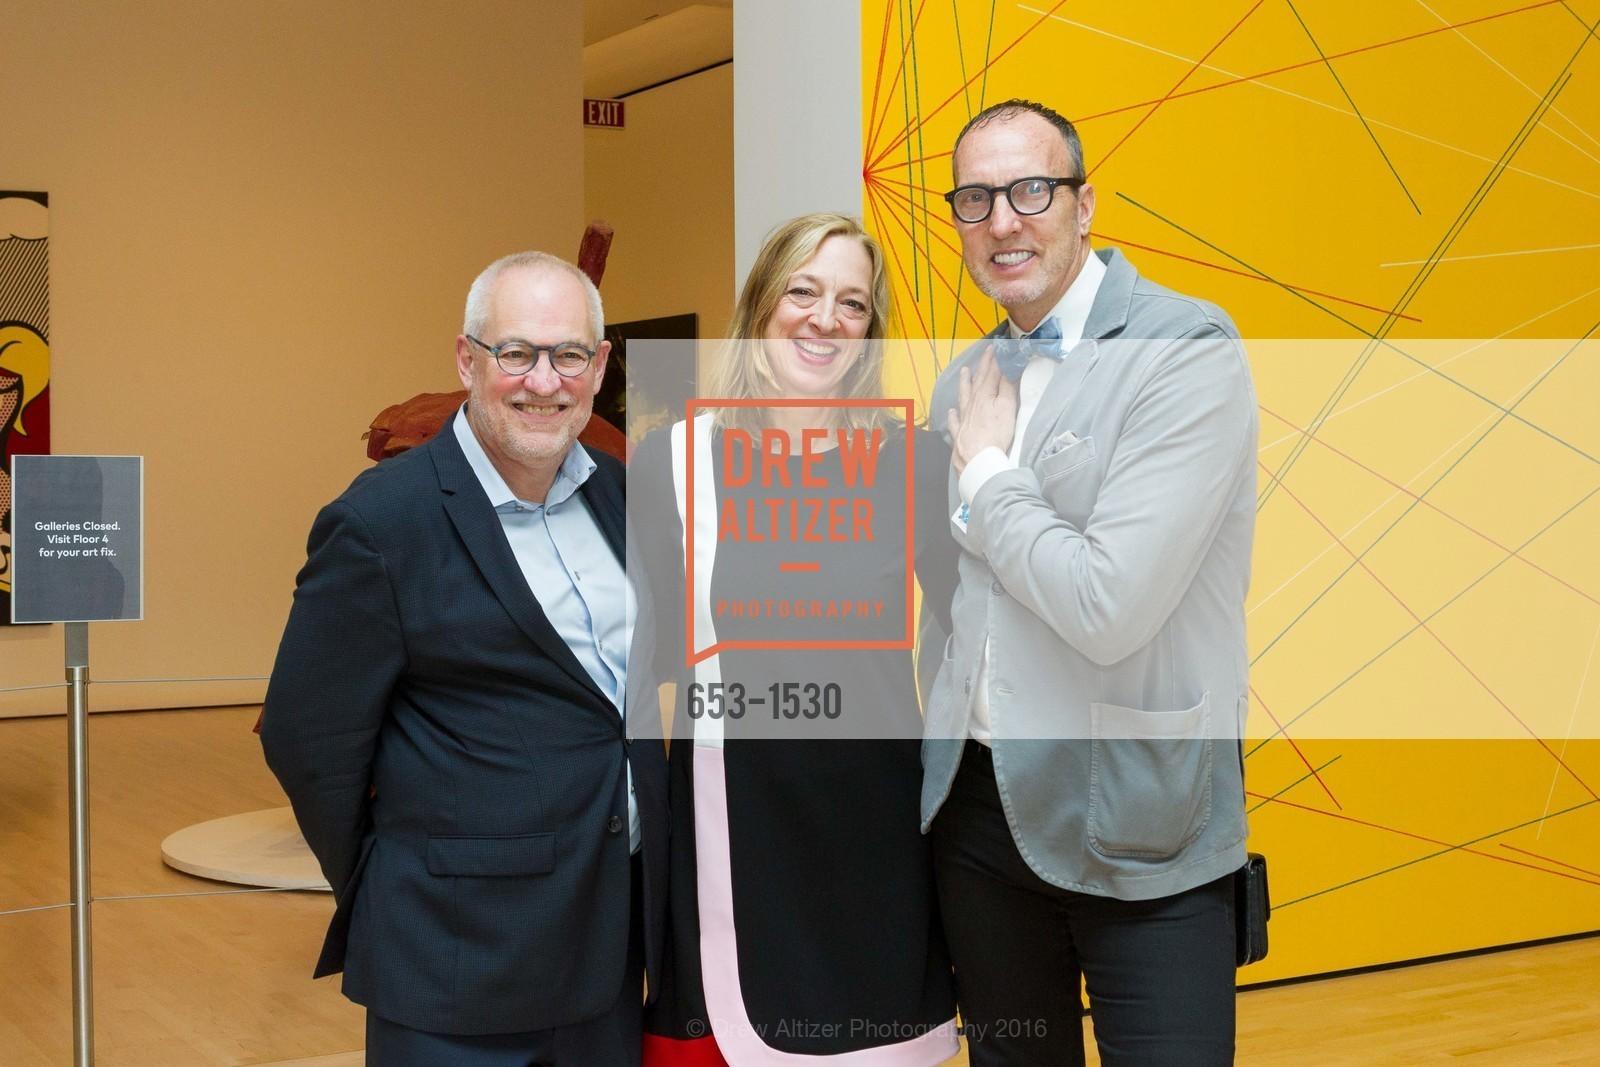 Gary Garrels, Ana Roth, Maynard Monrow, Photo #653-1530